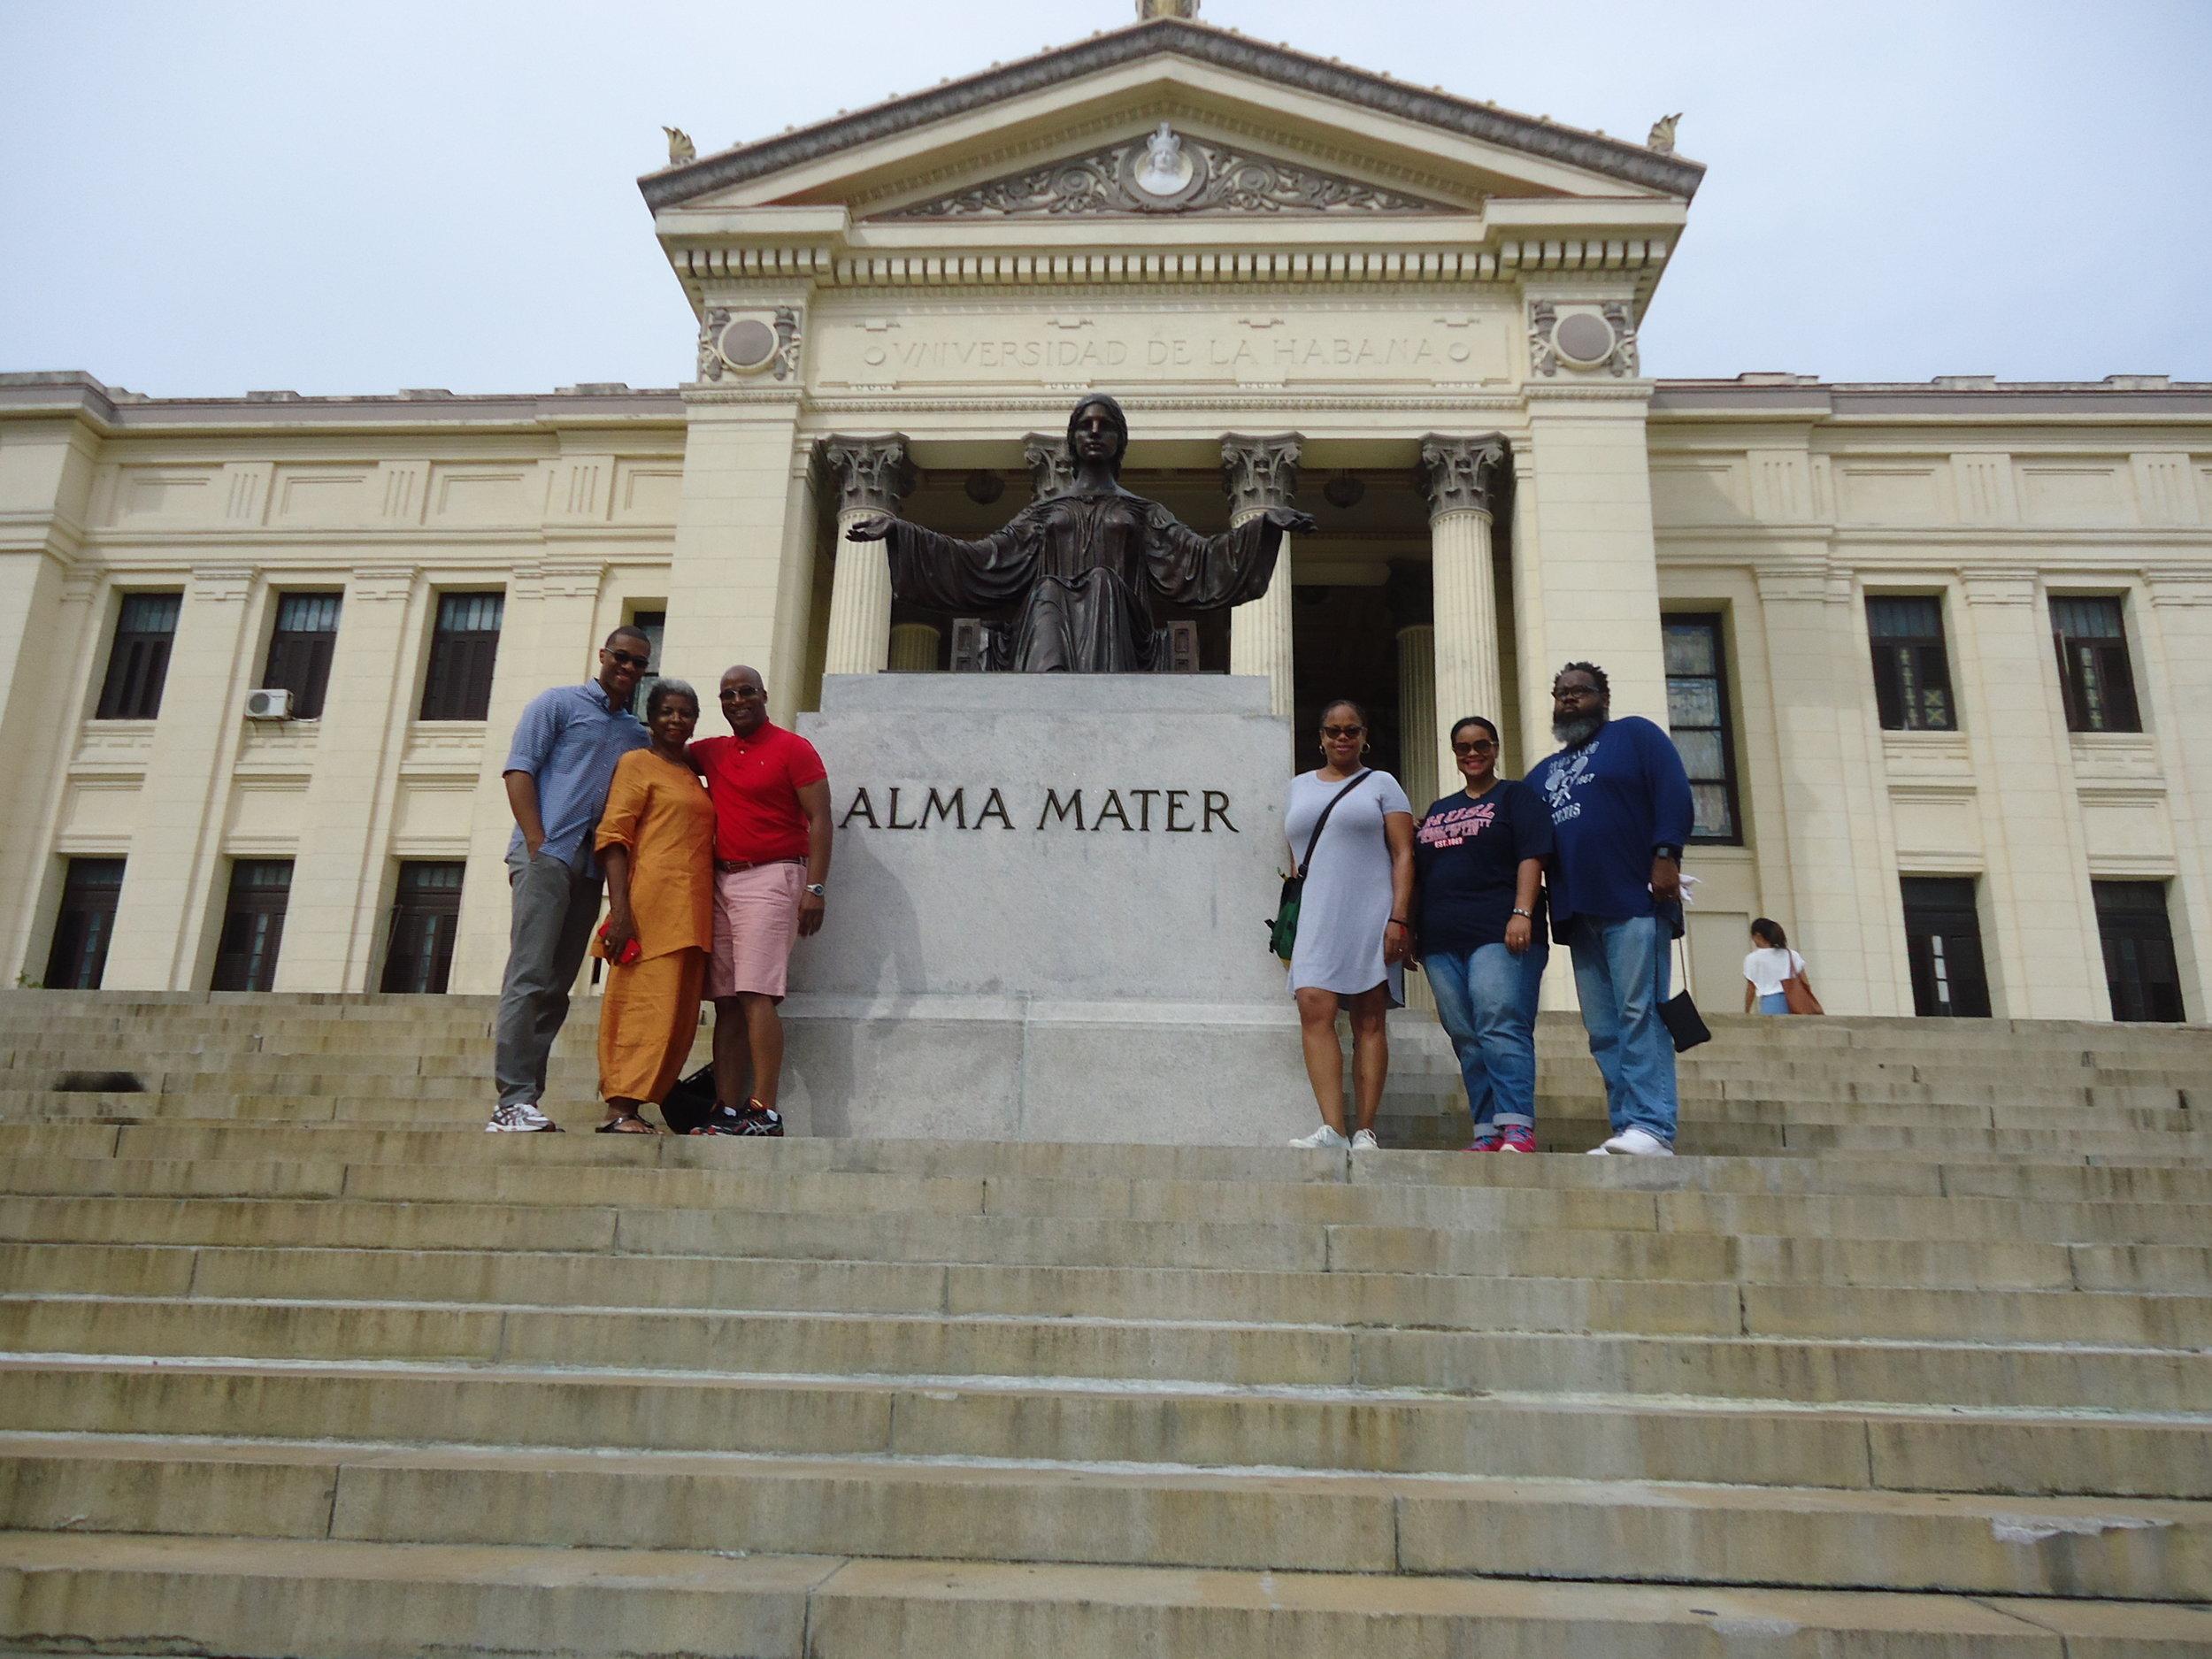 Howard University School of Law - 6 Days/5 Nights - Havana, Cuba | Tues., May 15, 2018 - Sun., May 20, 2018